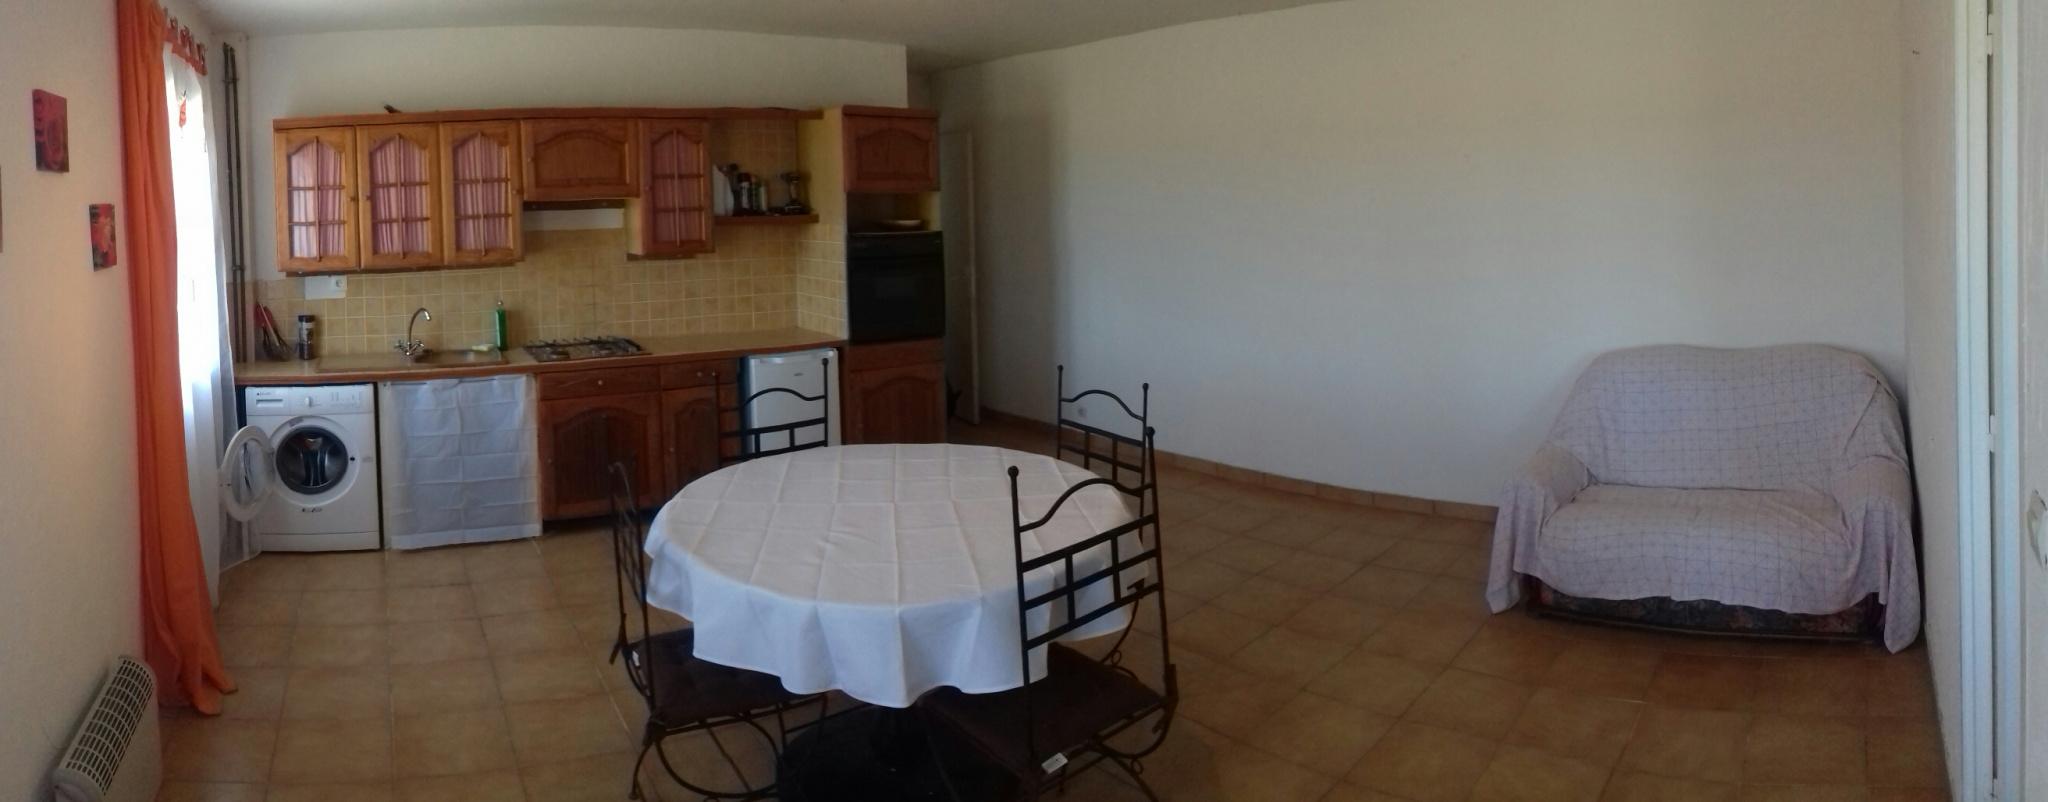 Salle à manger appartement locatif.